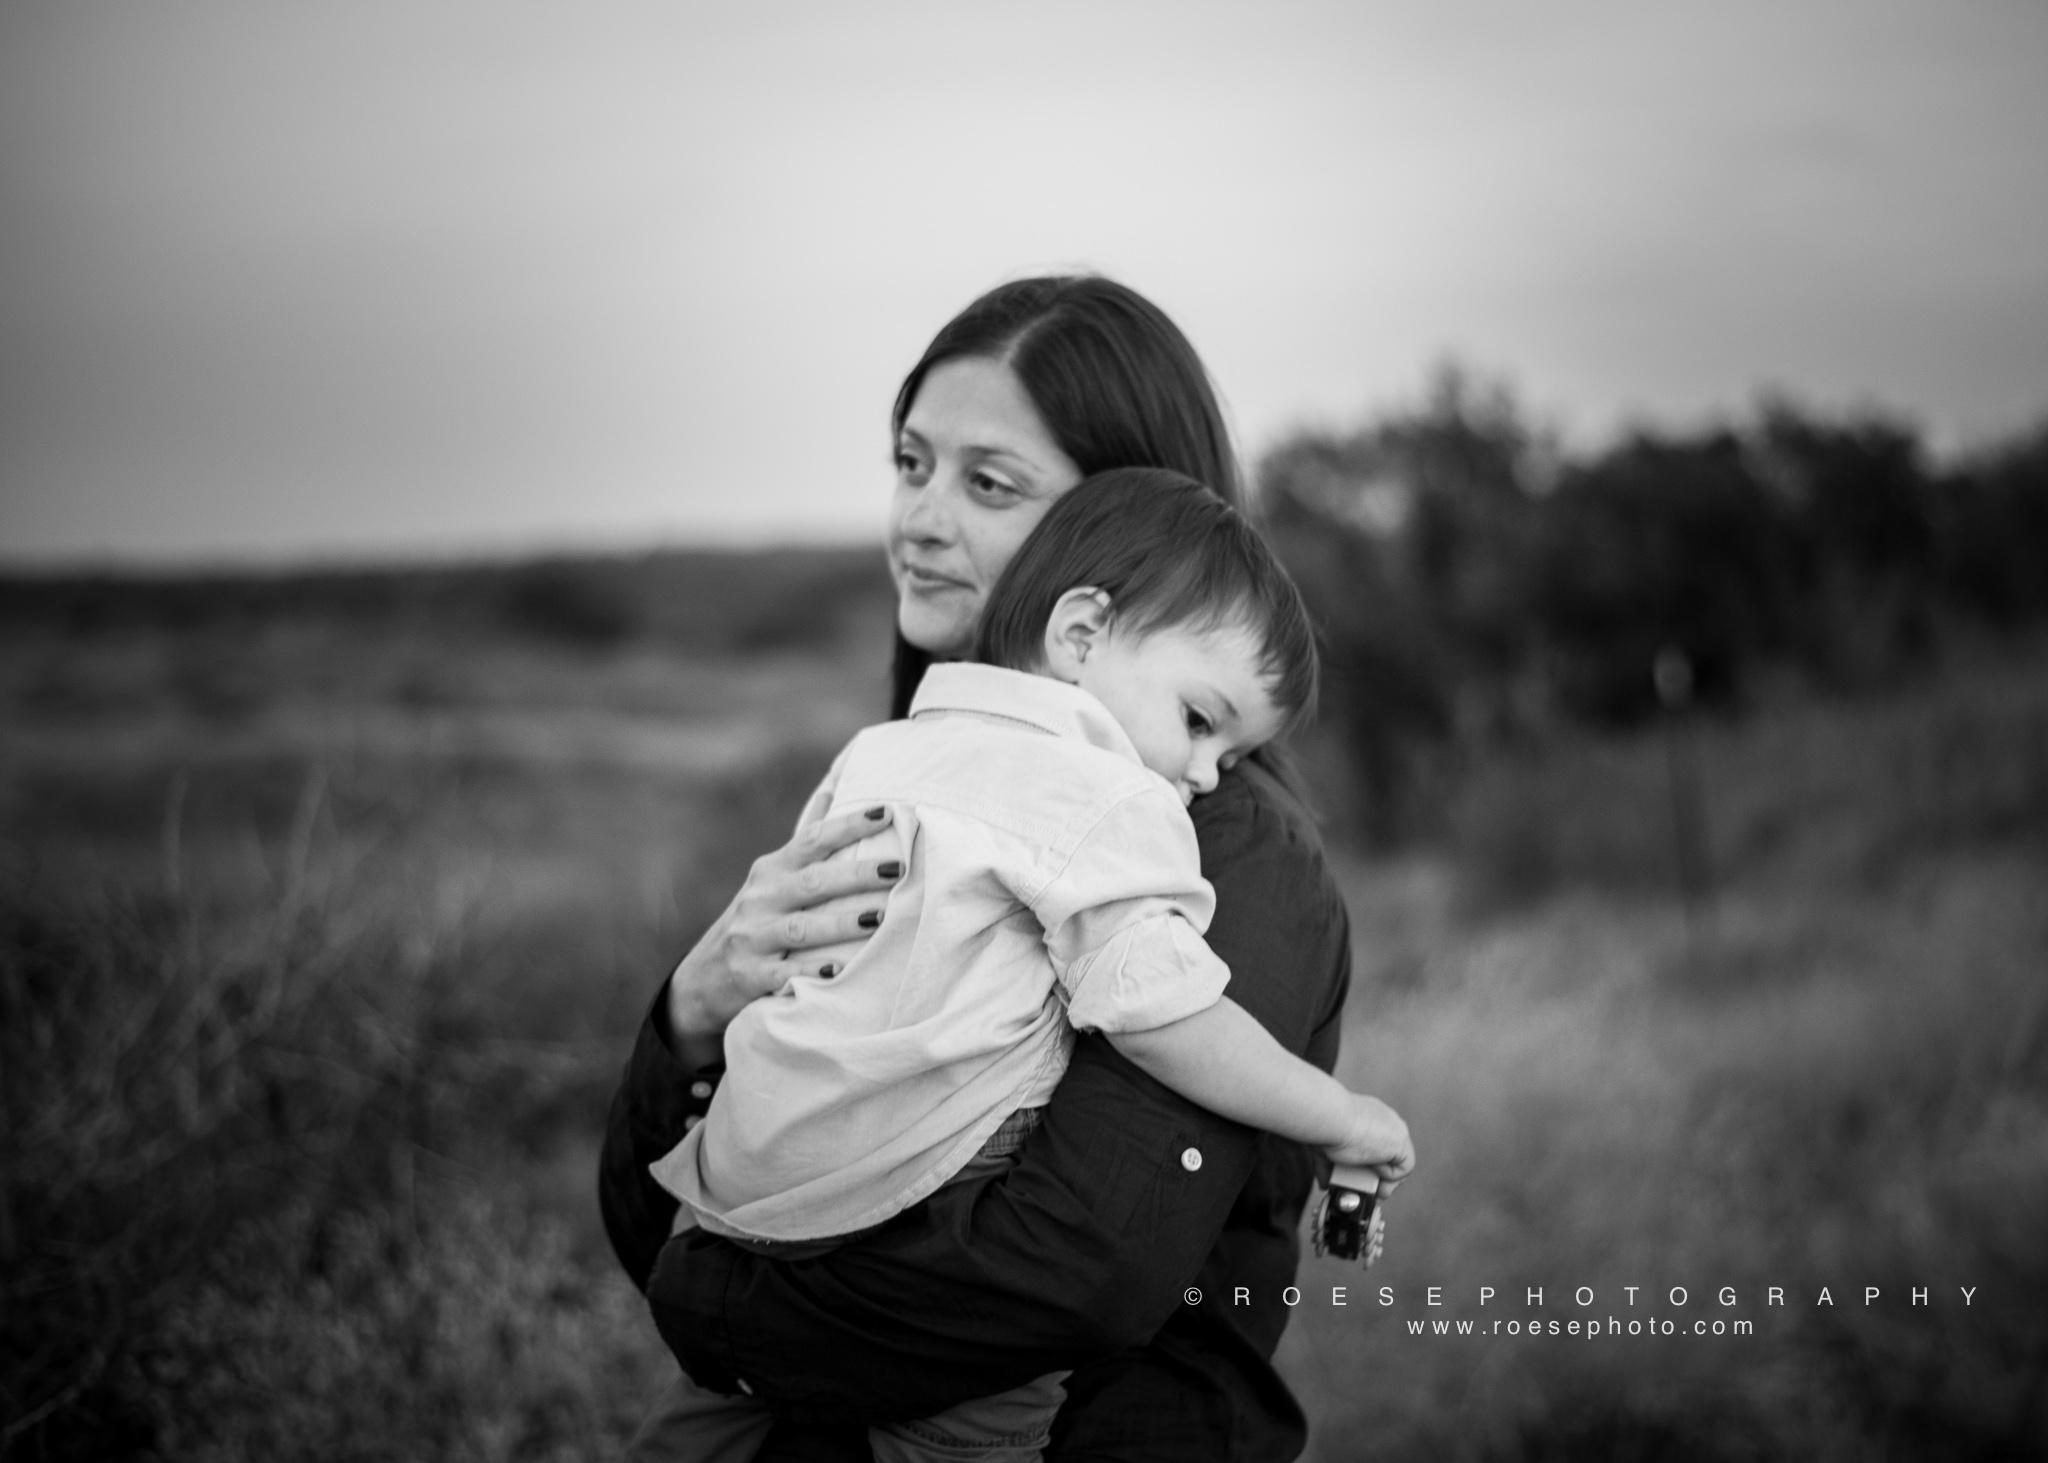 C.-Roese-Ramp-Roese-Photography-LLC.-Bennett-Family-30.jpg